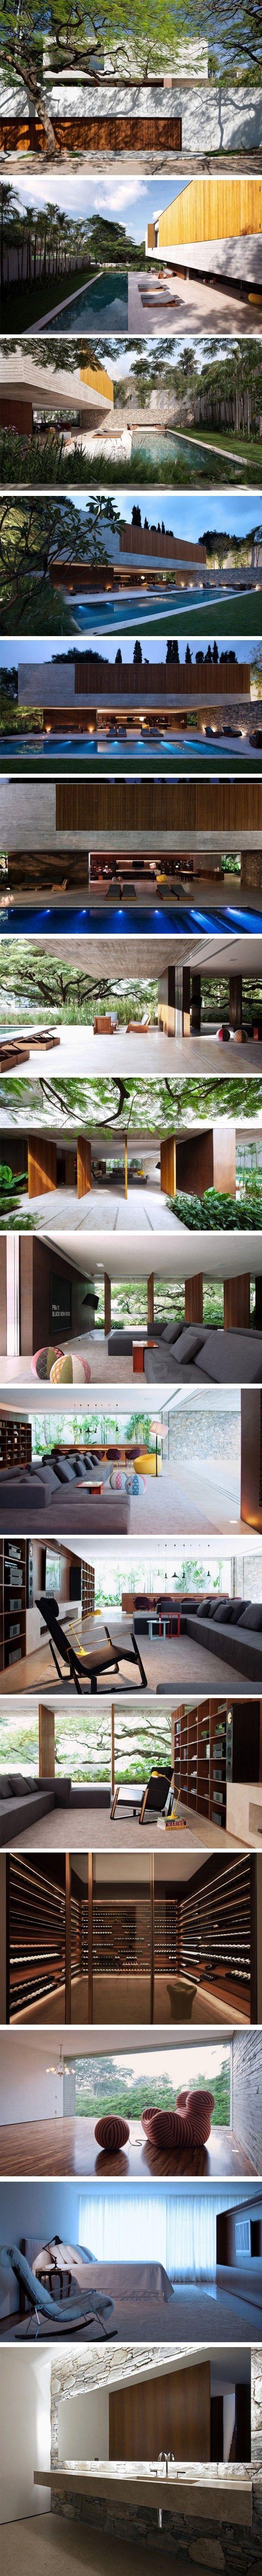 nice Ipês House par StudioMK27 - Journal du Design by http://www.danazhome-decor.xyz/modern-home-design/ipes-house-par-studiomk27-journal-du-design/